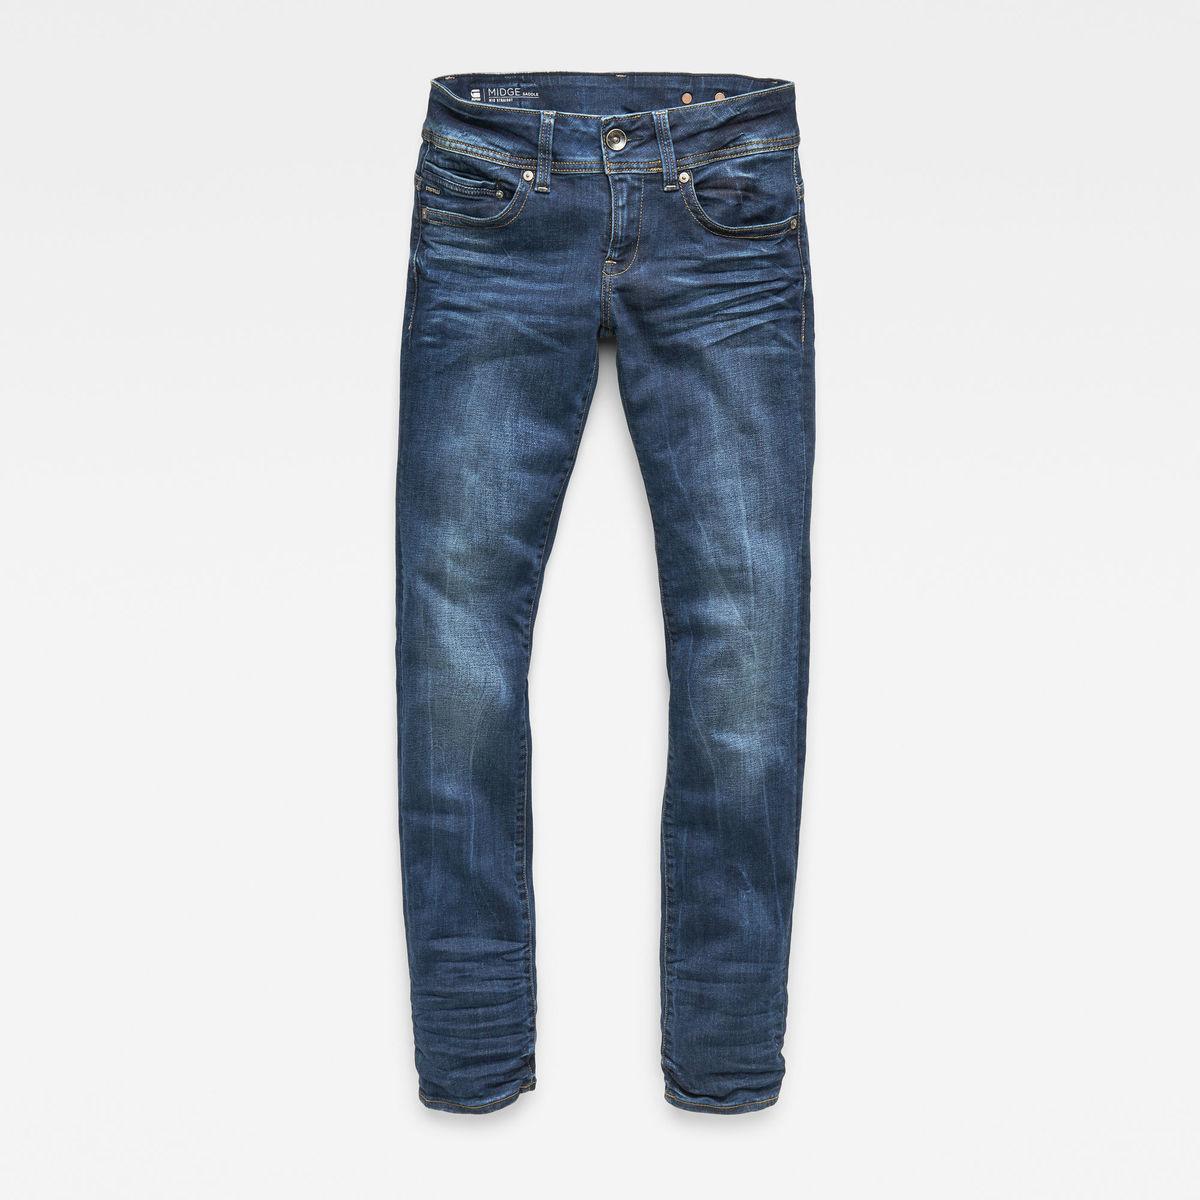 Bild 4 von Midge Saddle Mid Waist Straight Jeans